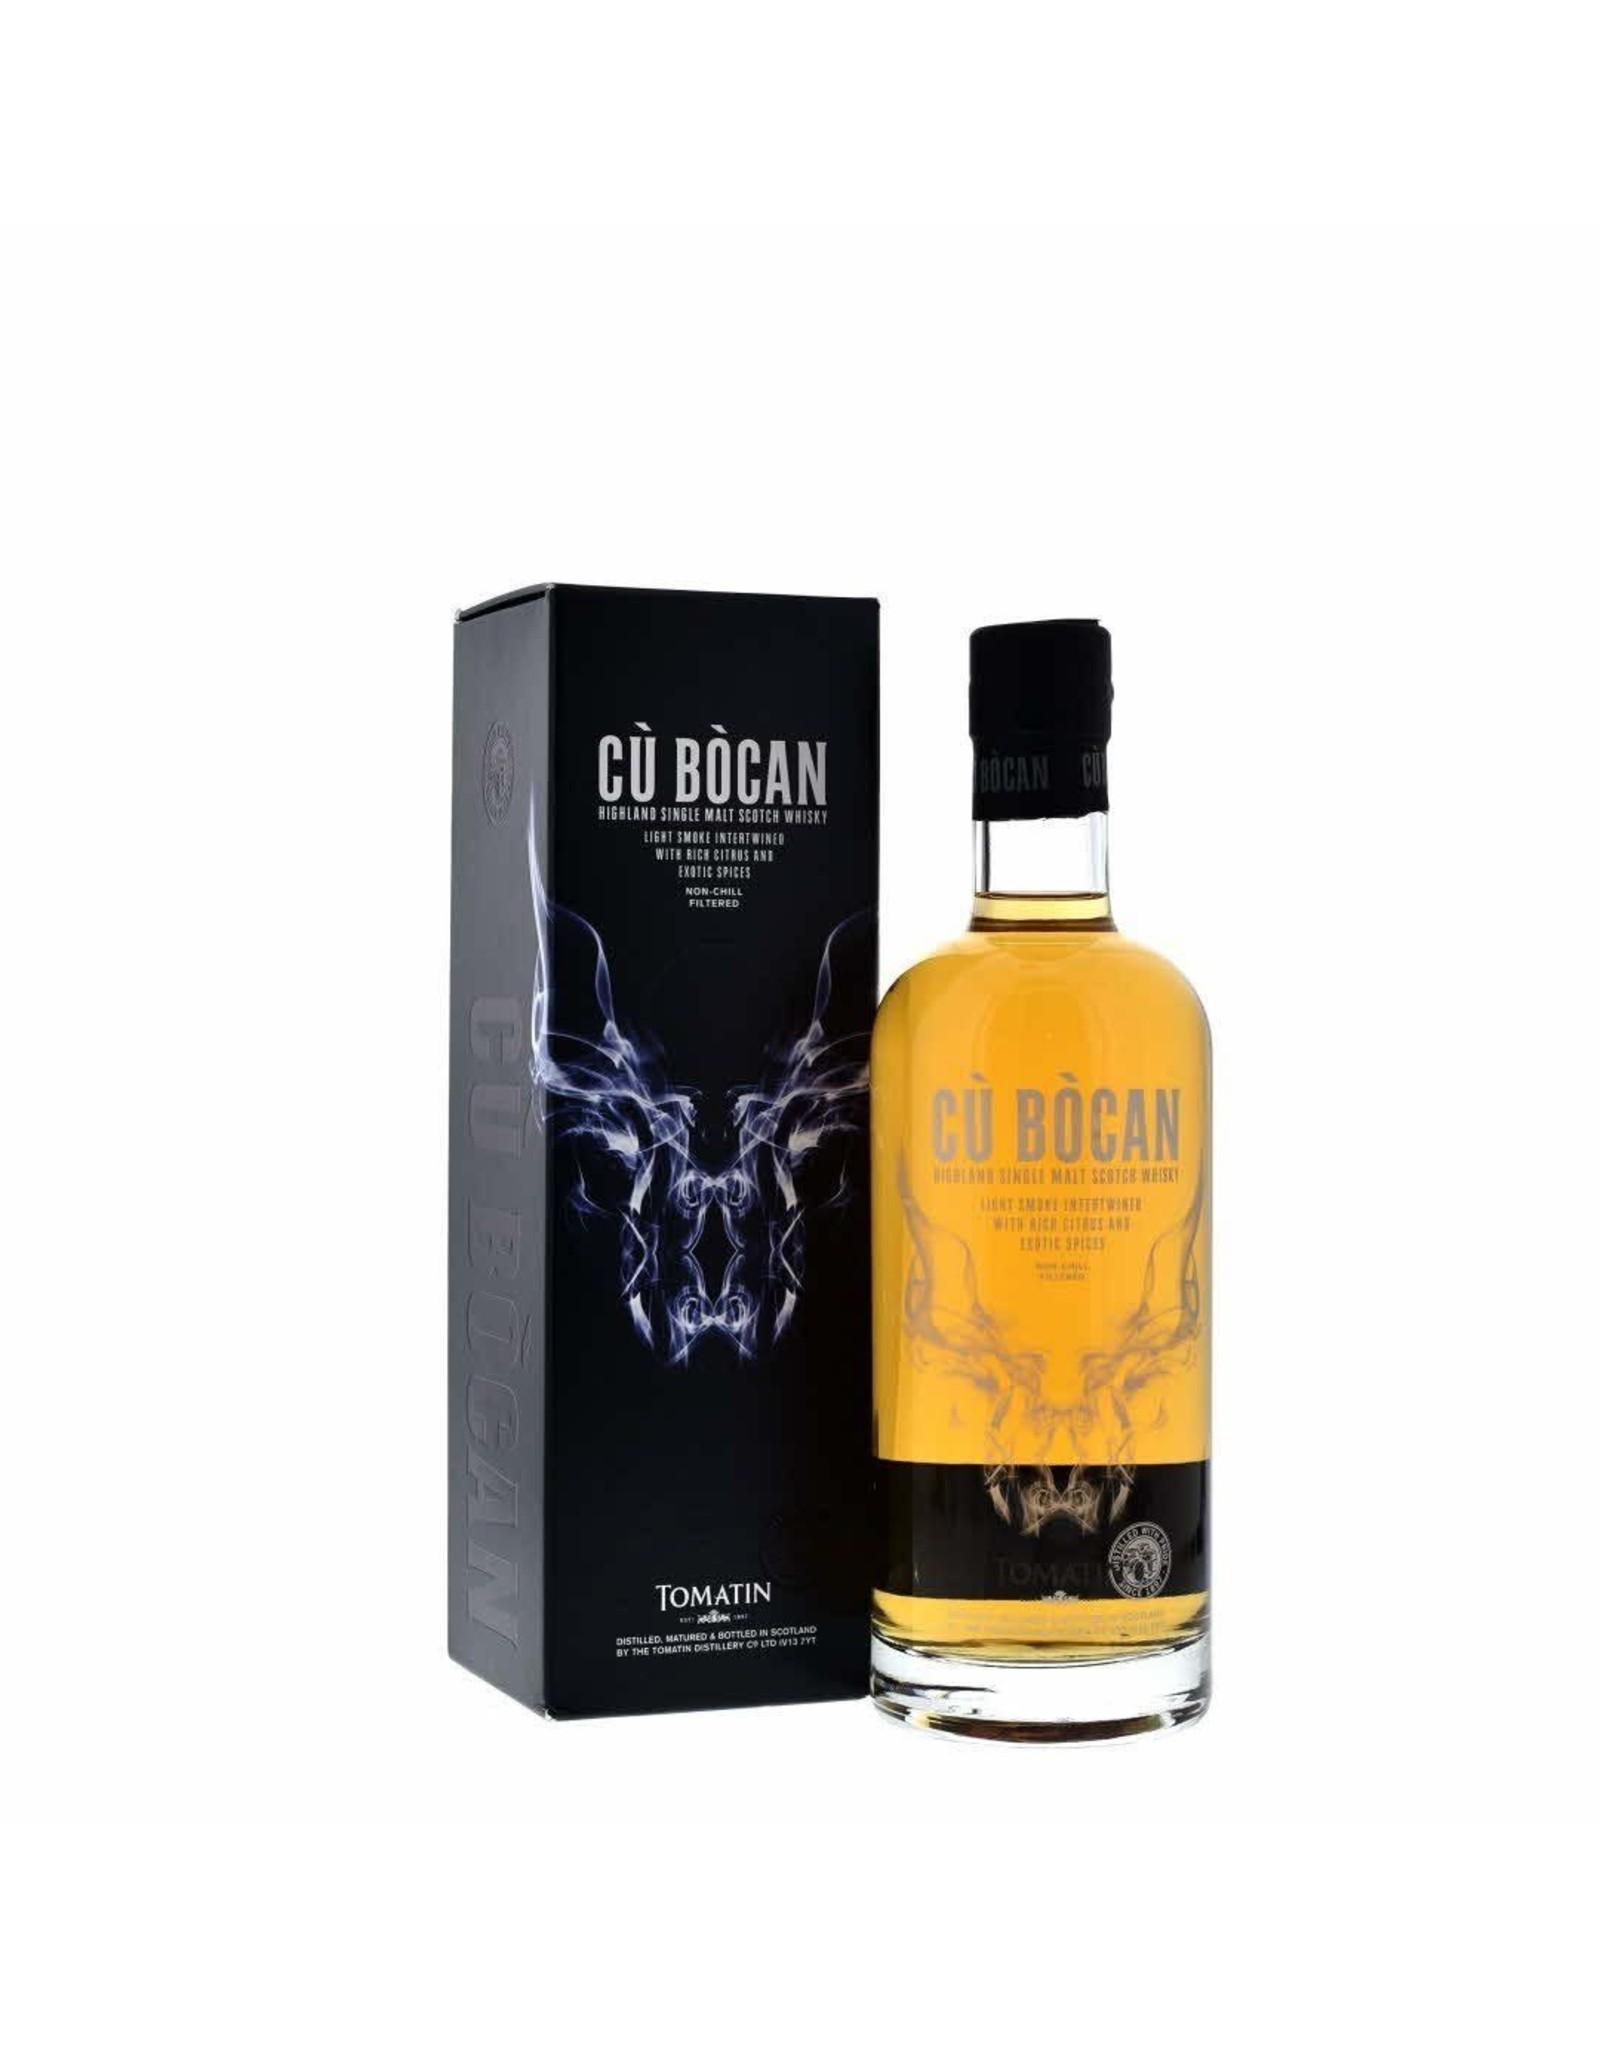 Tomatin Cu Bocan Single Malt Scotch Whiskey